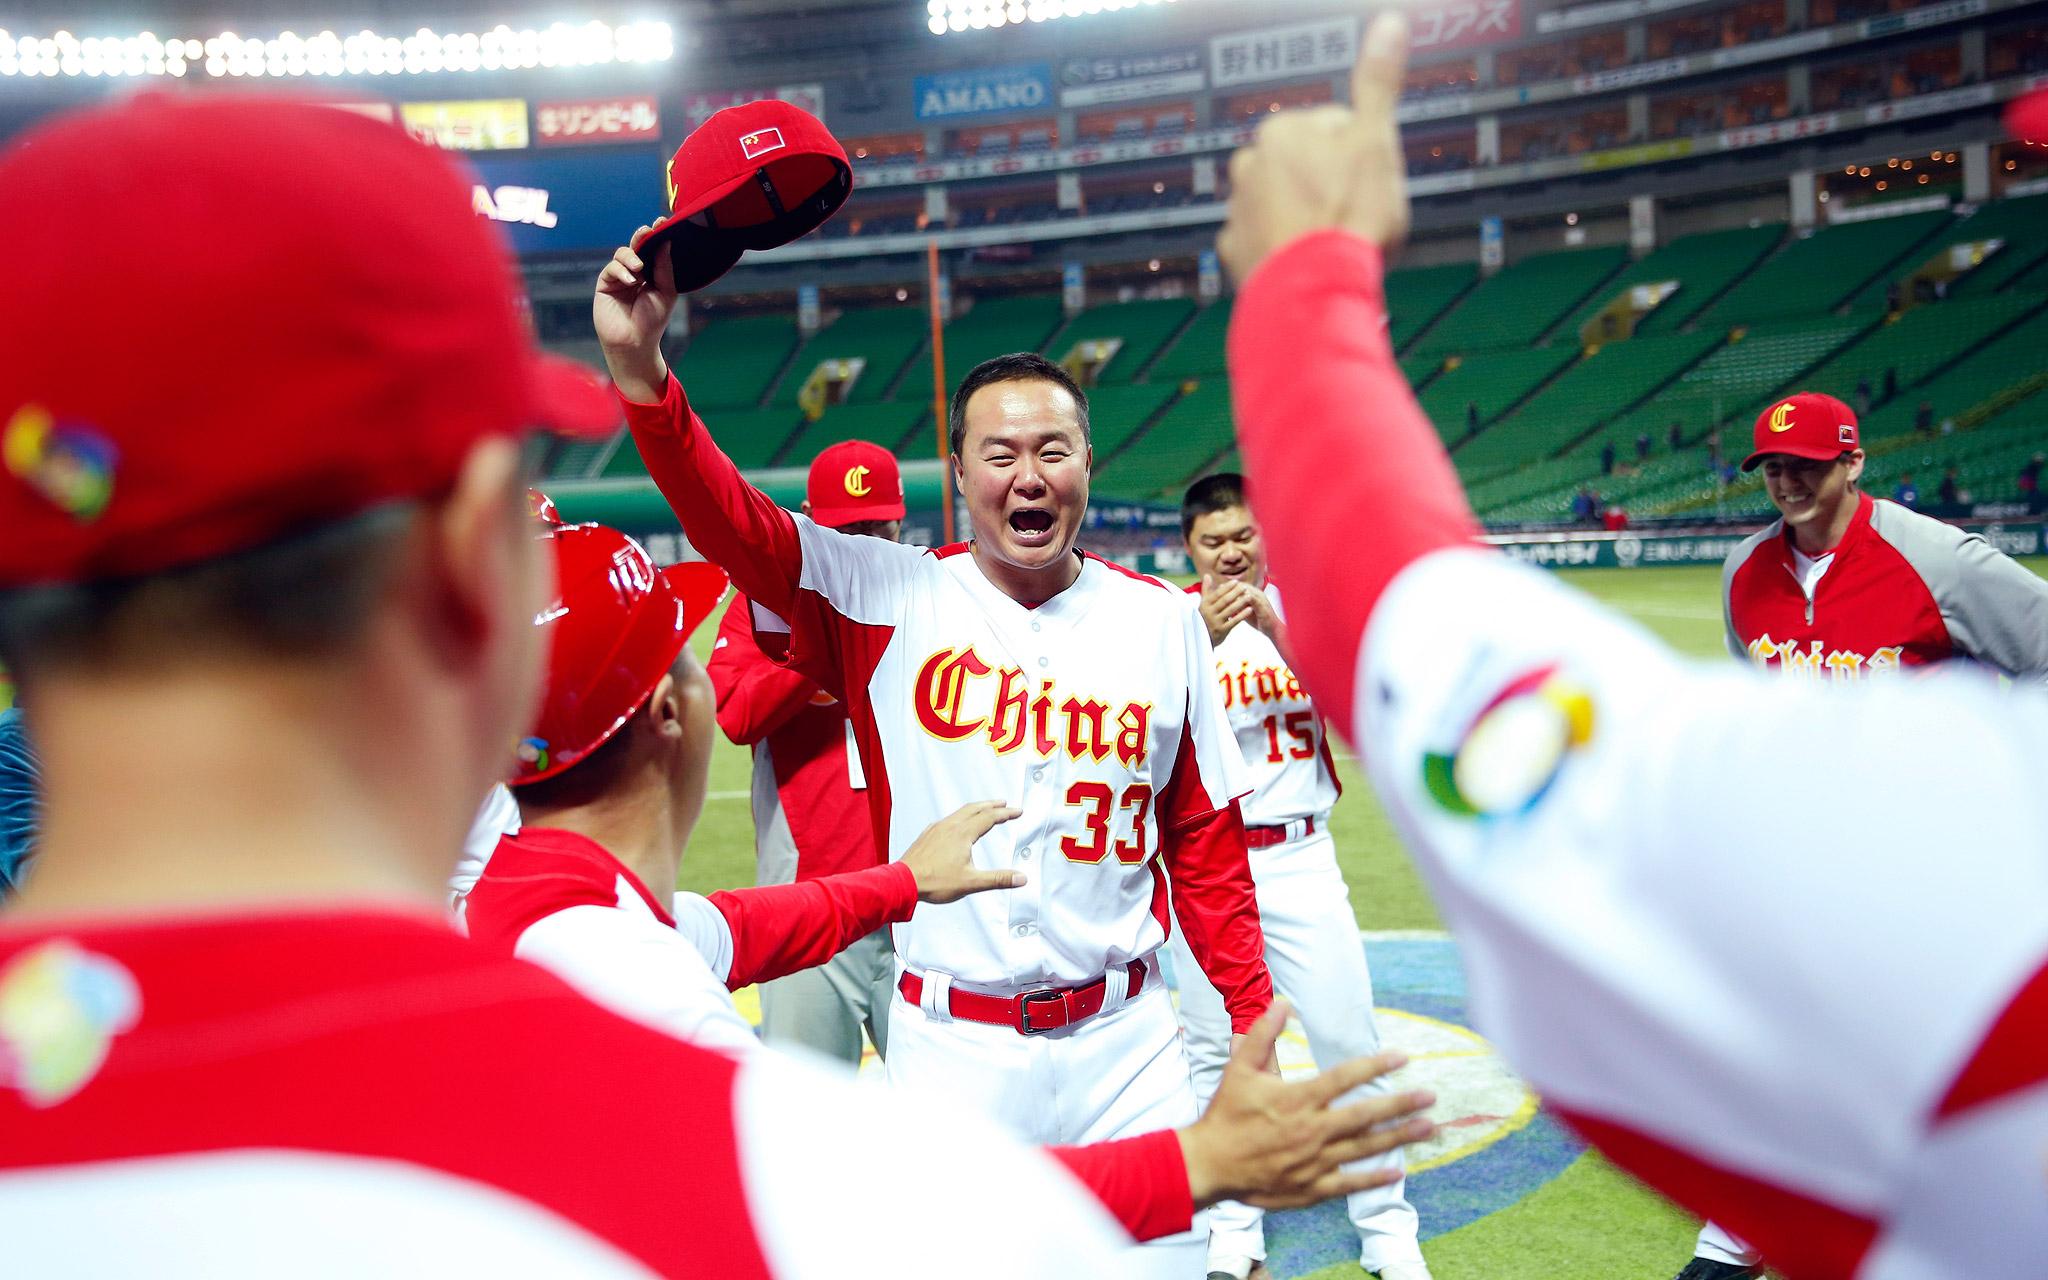 Team China celebrates